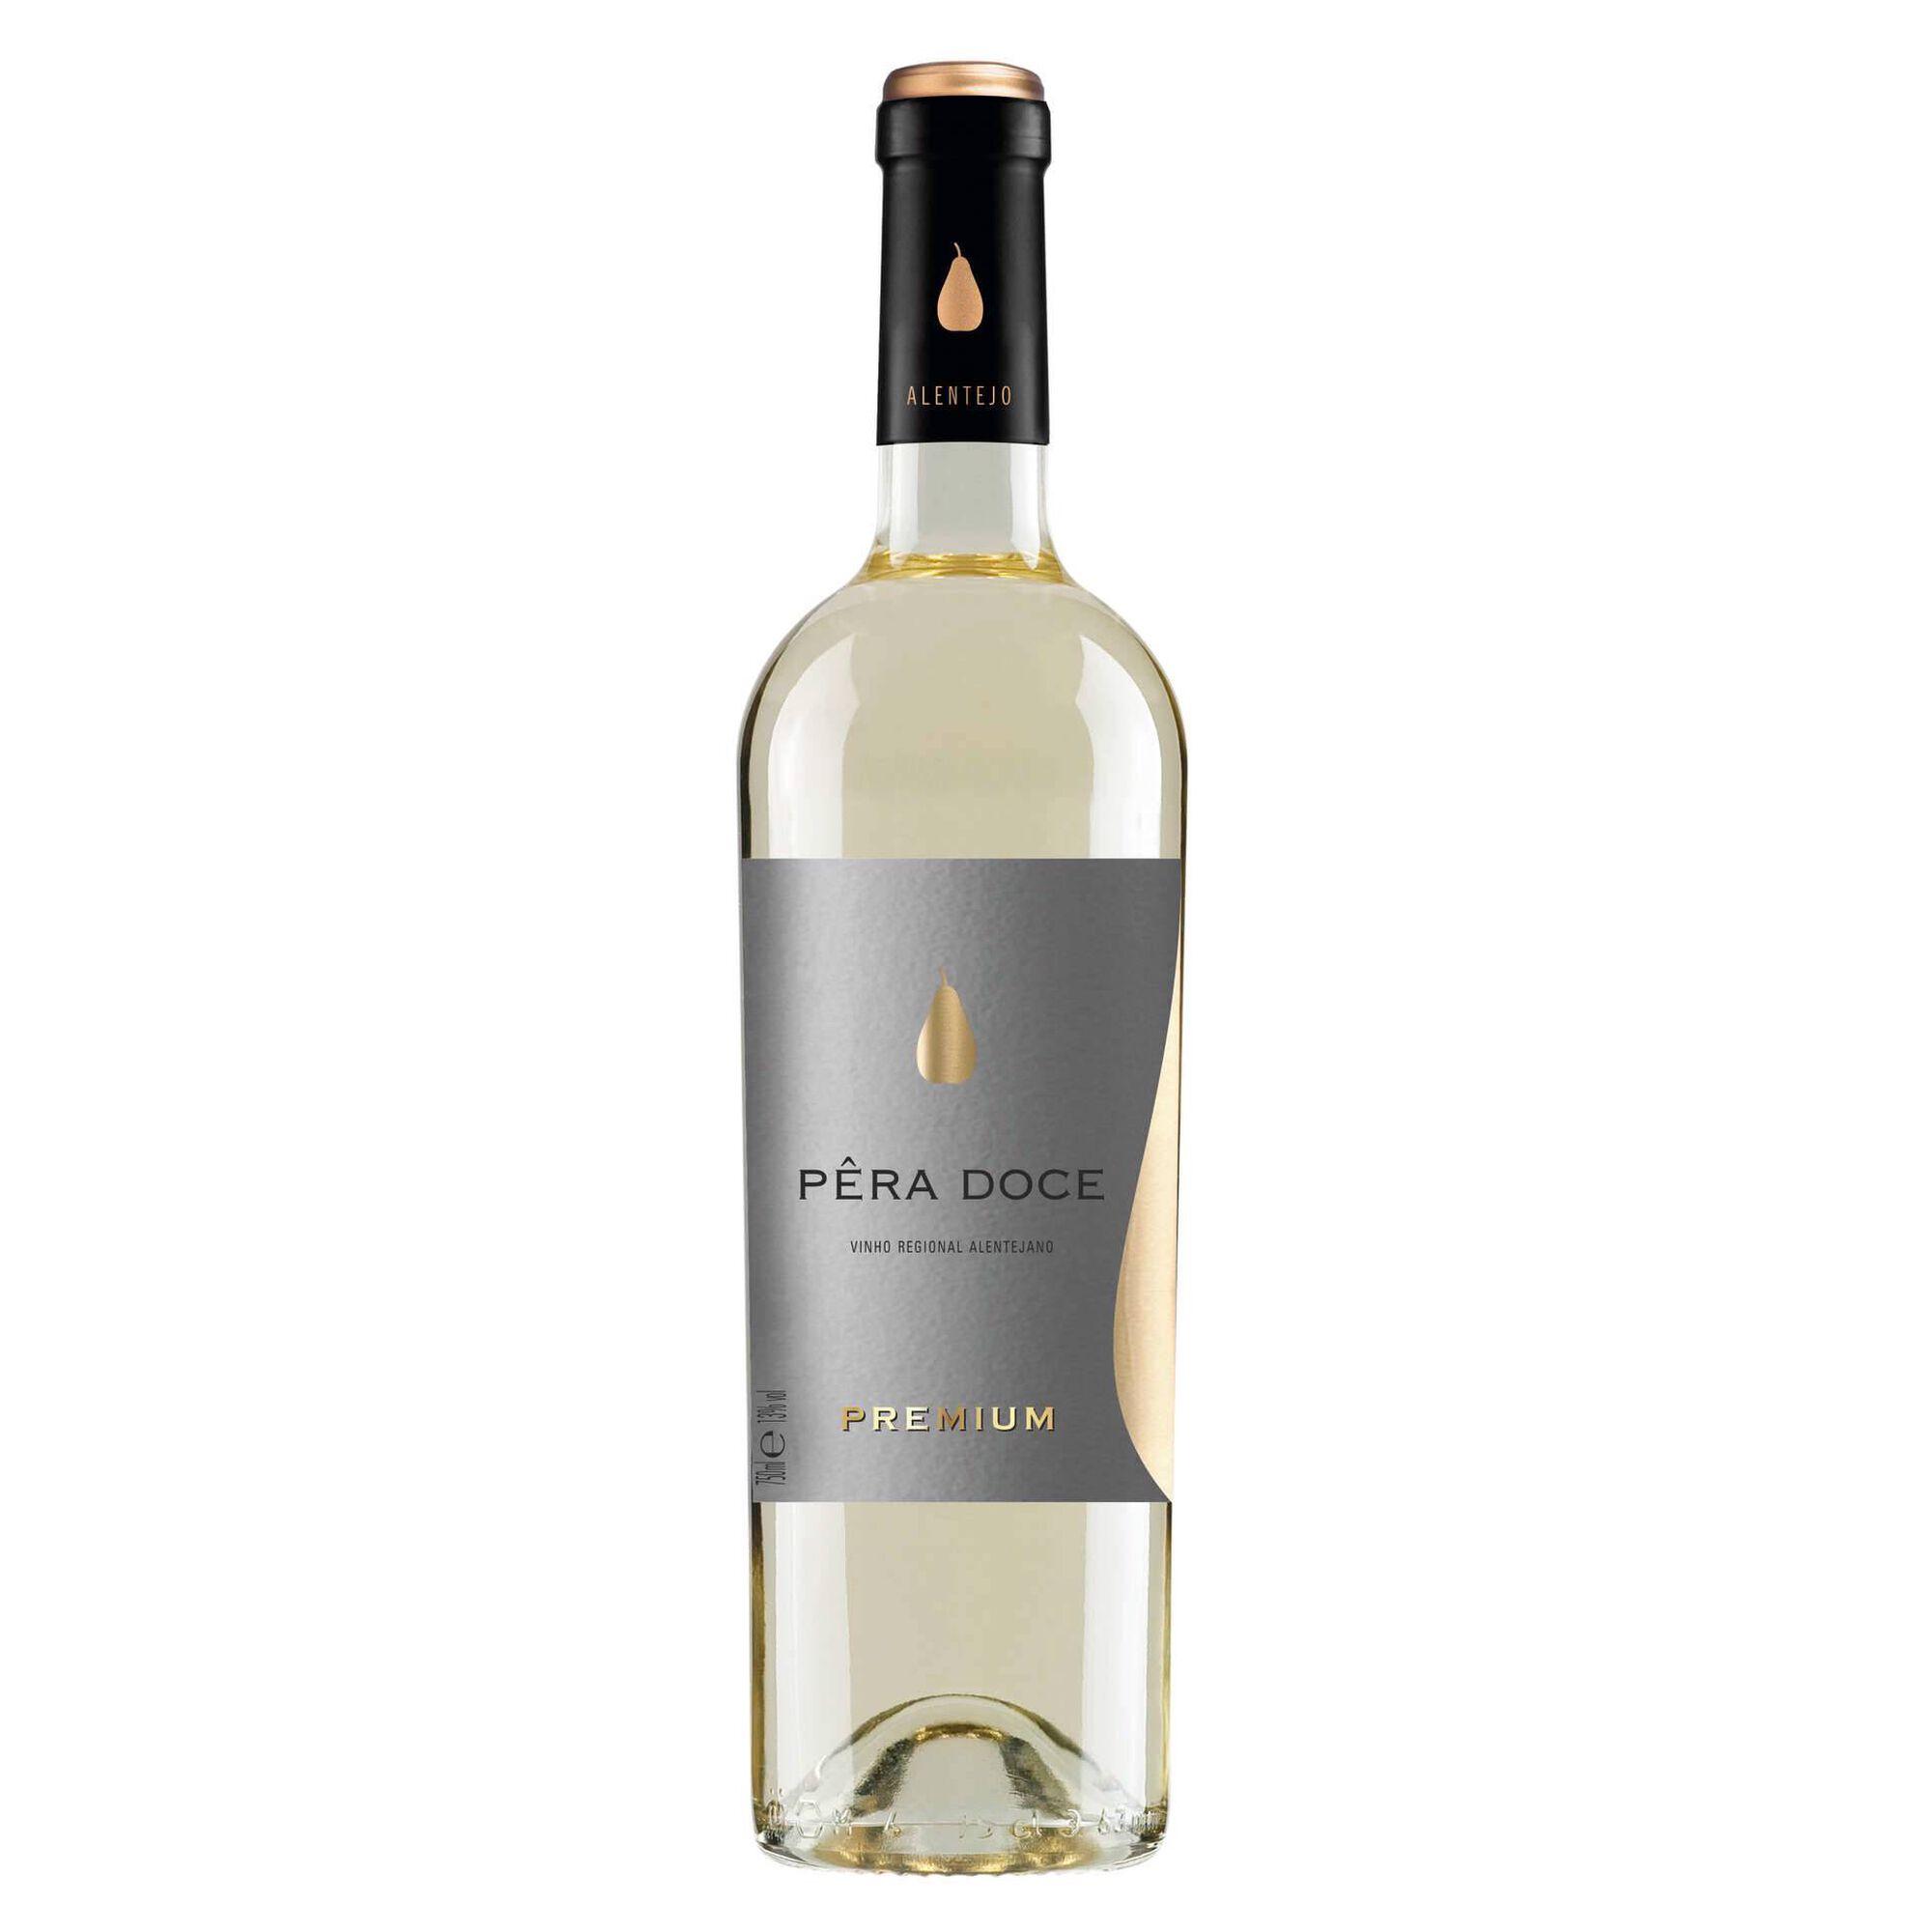 Pera Doce Premium Regional Alentejano Vinho Branco